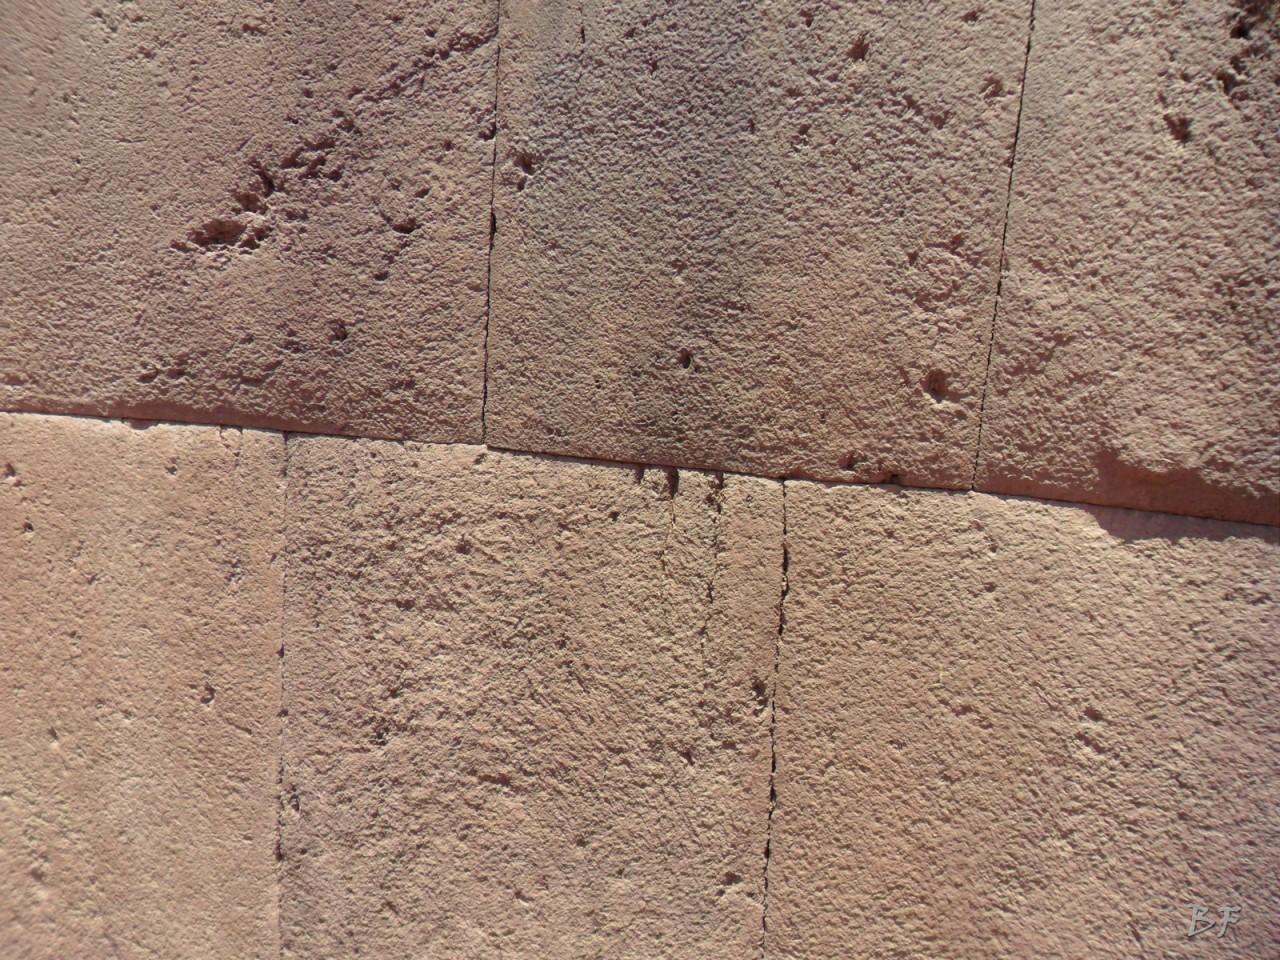 Parco-Archeologico-Megaliti-Rumicolca-Cusco-Perù-11